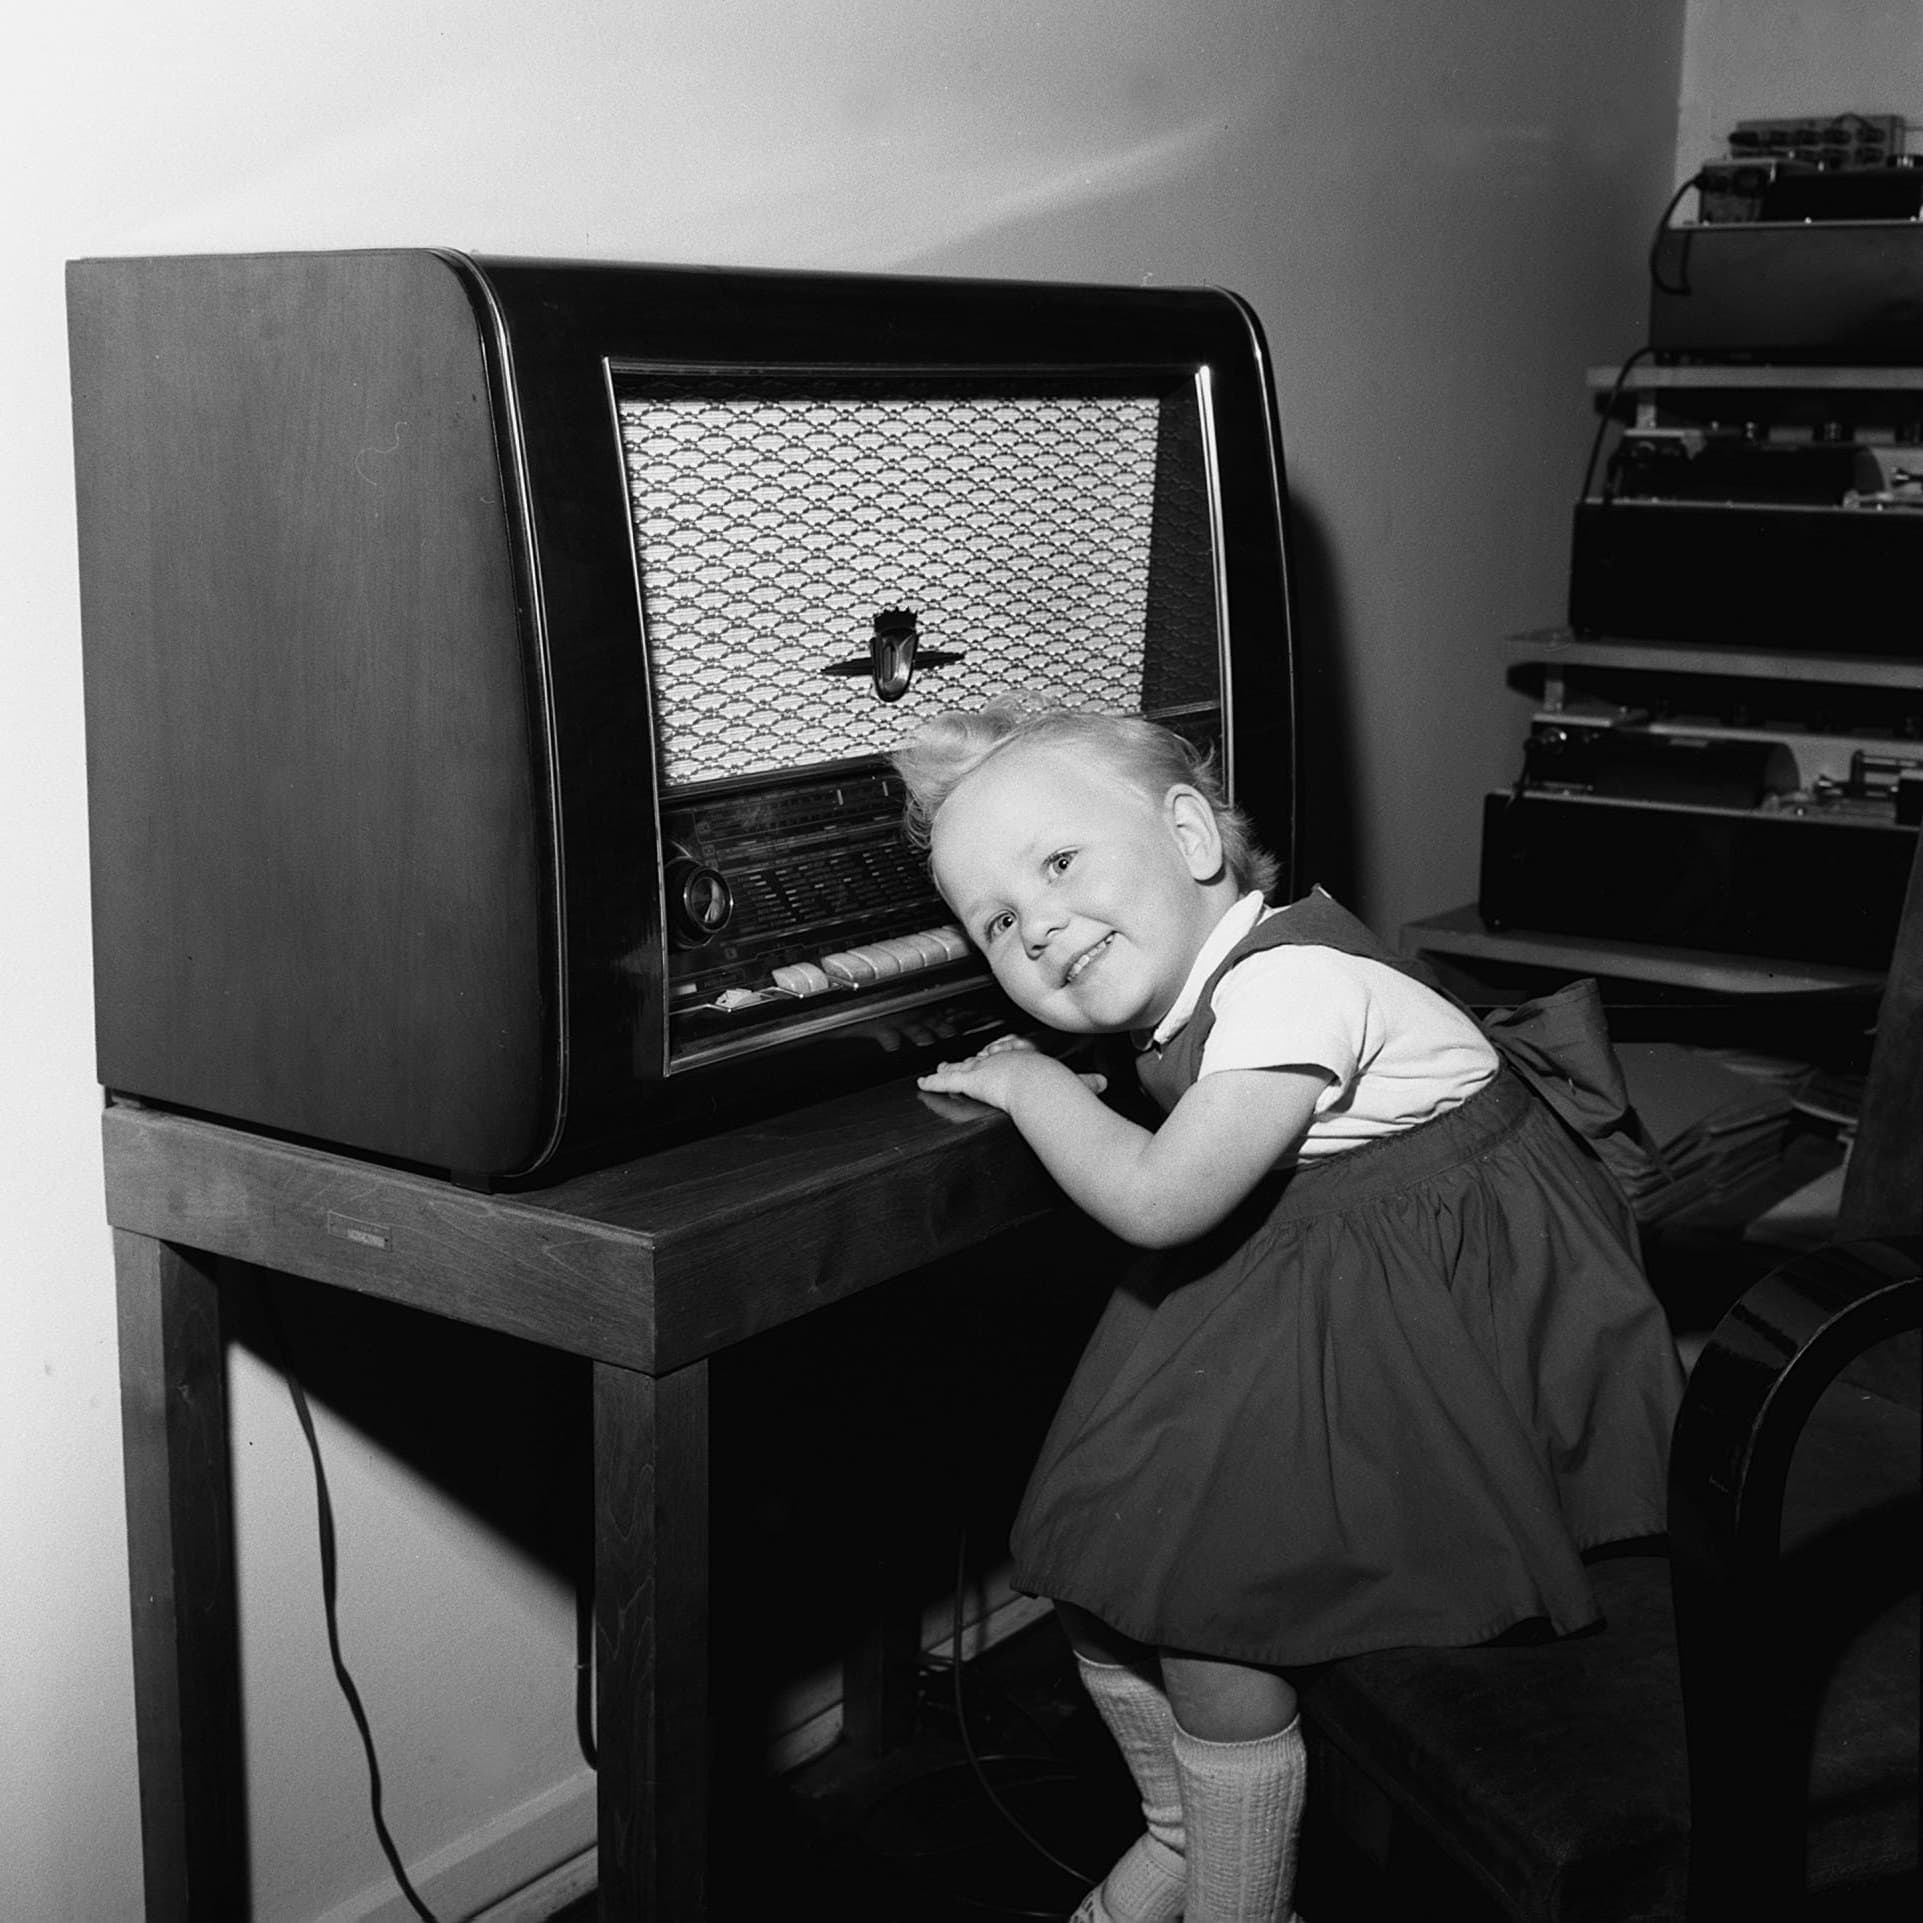 Pieni tyttö (Liisa Jussila 3 v.) kuuntelee radiota.